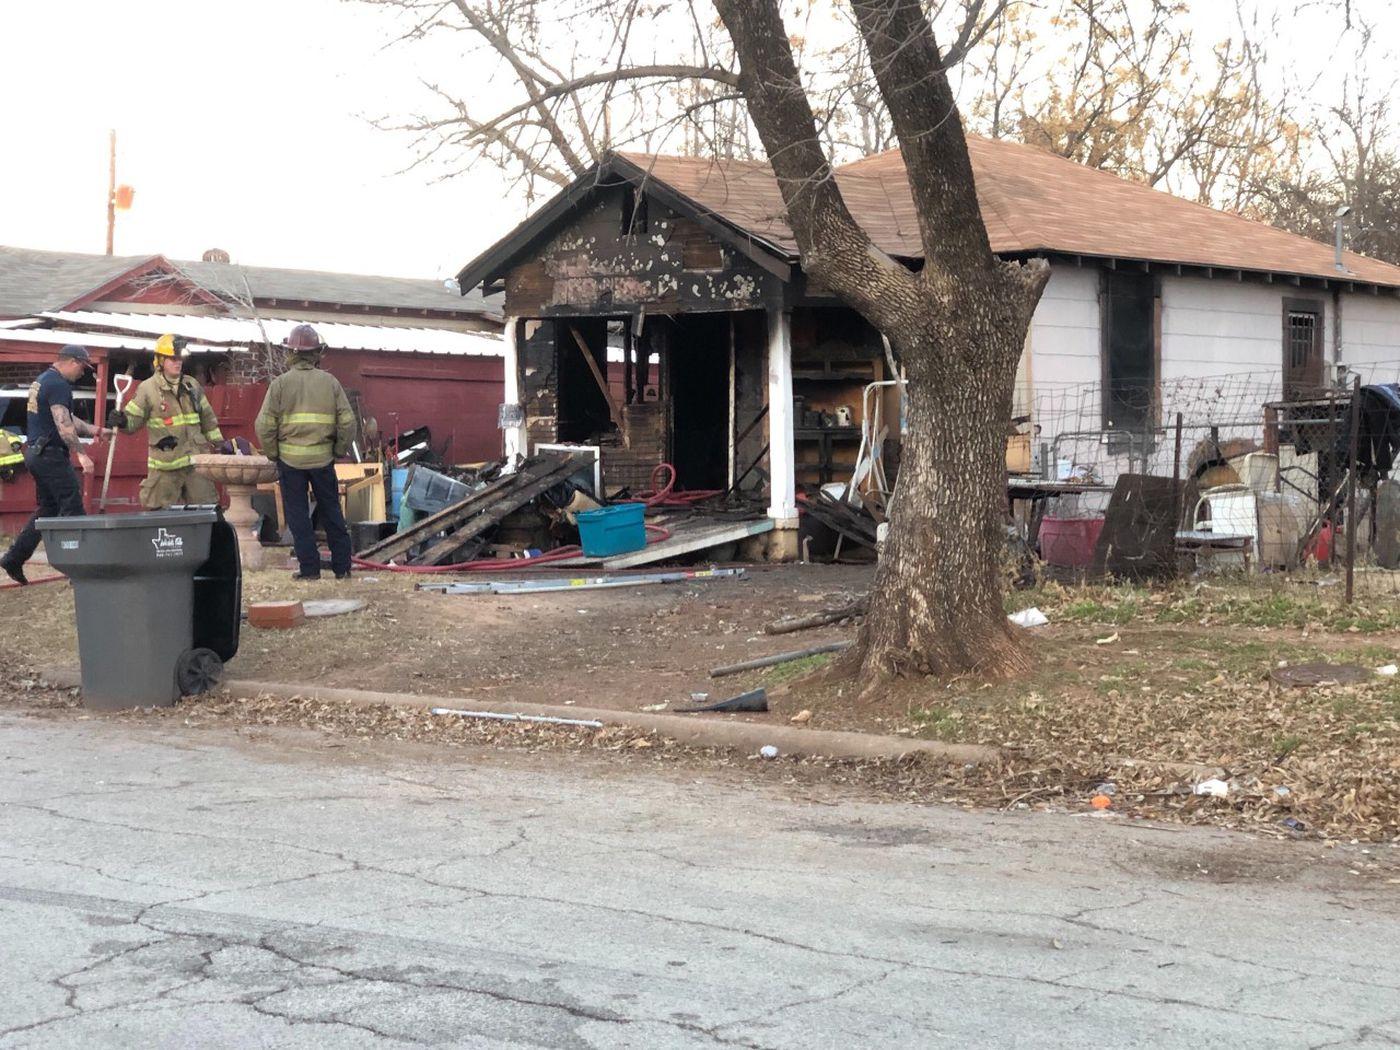 Ford House Wichita Falls Tx >> Family Pet Dies In Wichita Falls House Fire